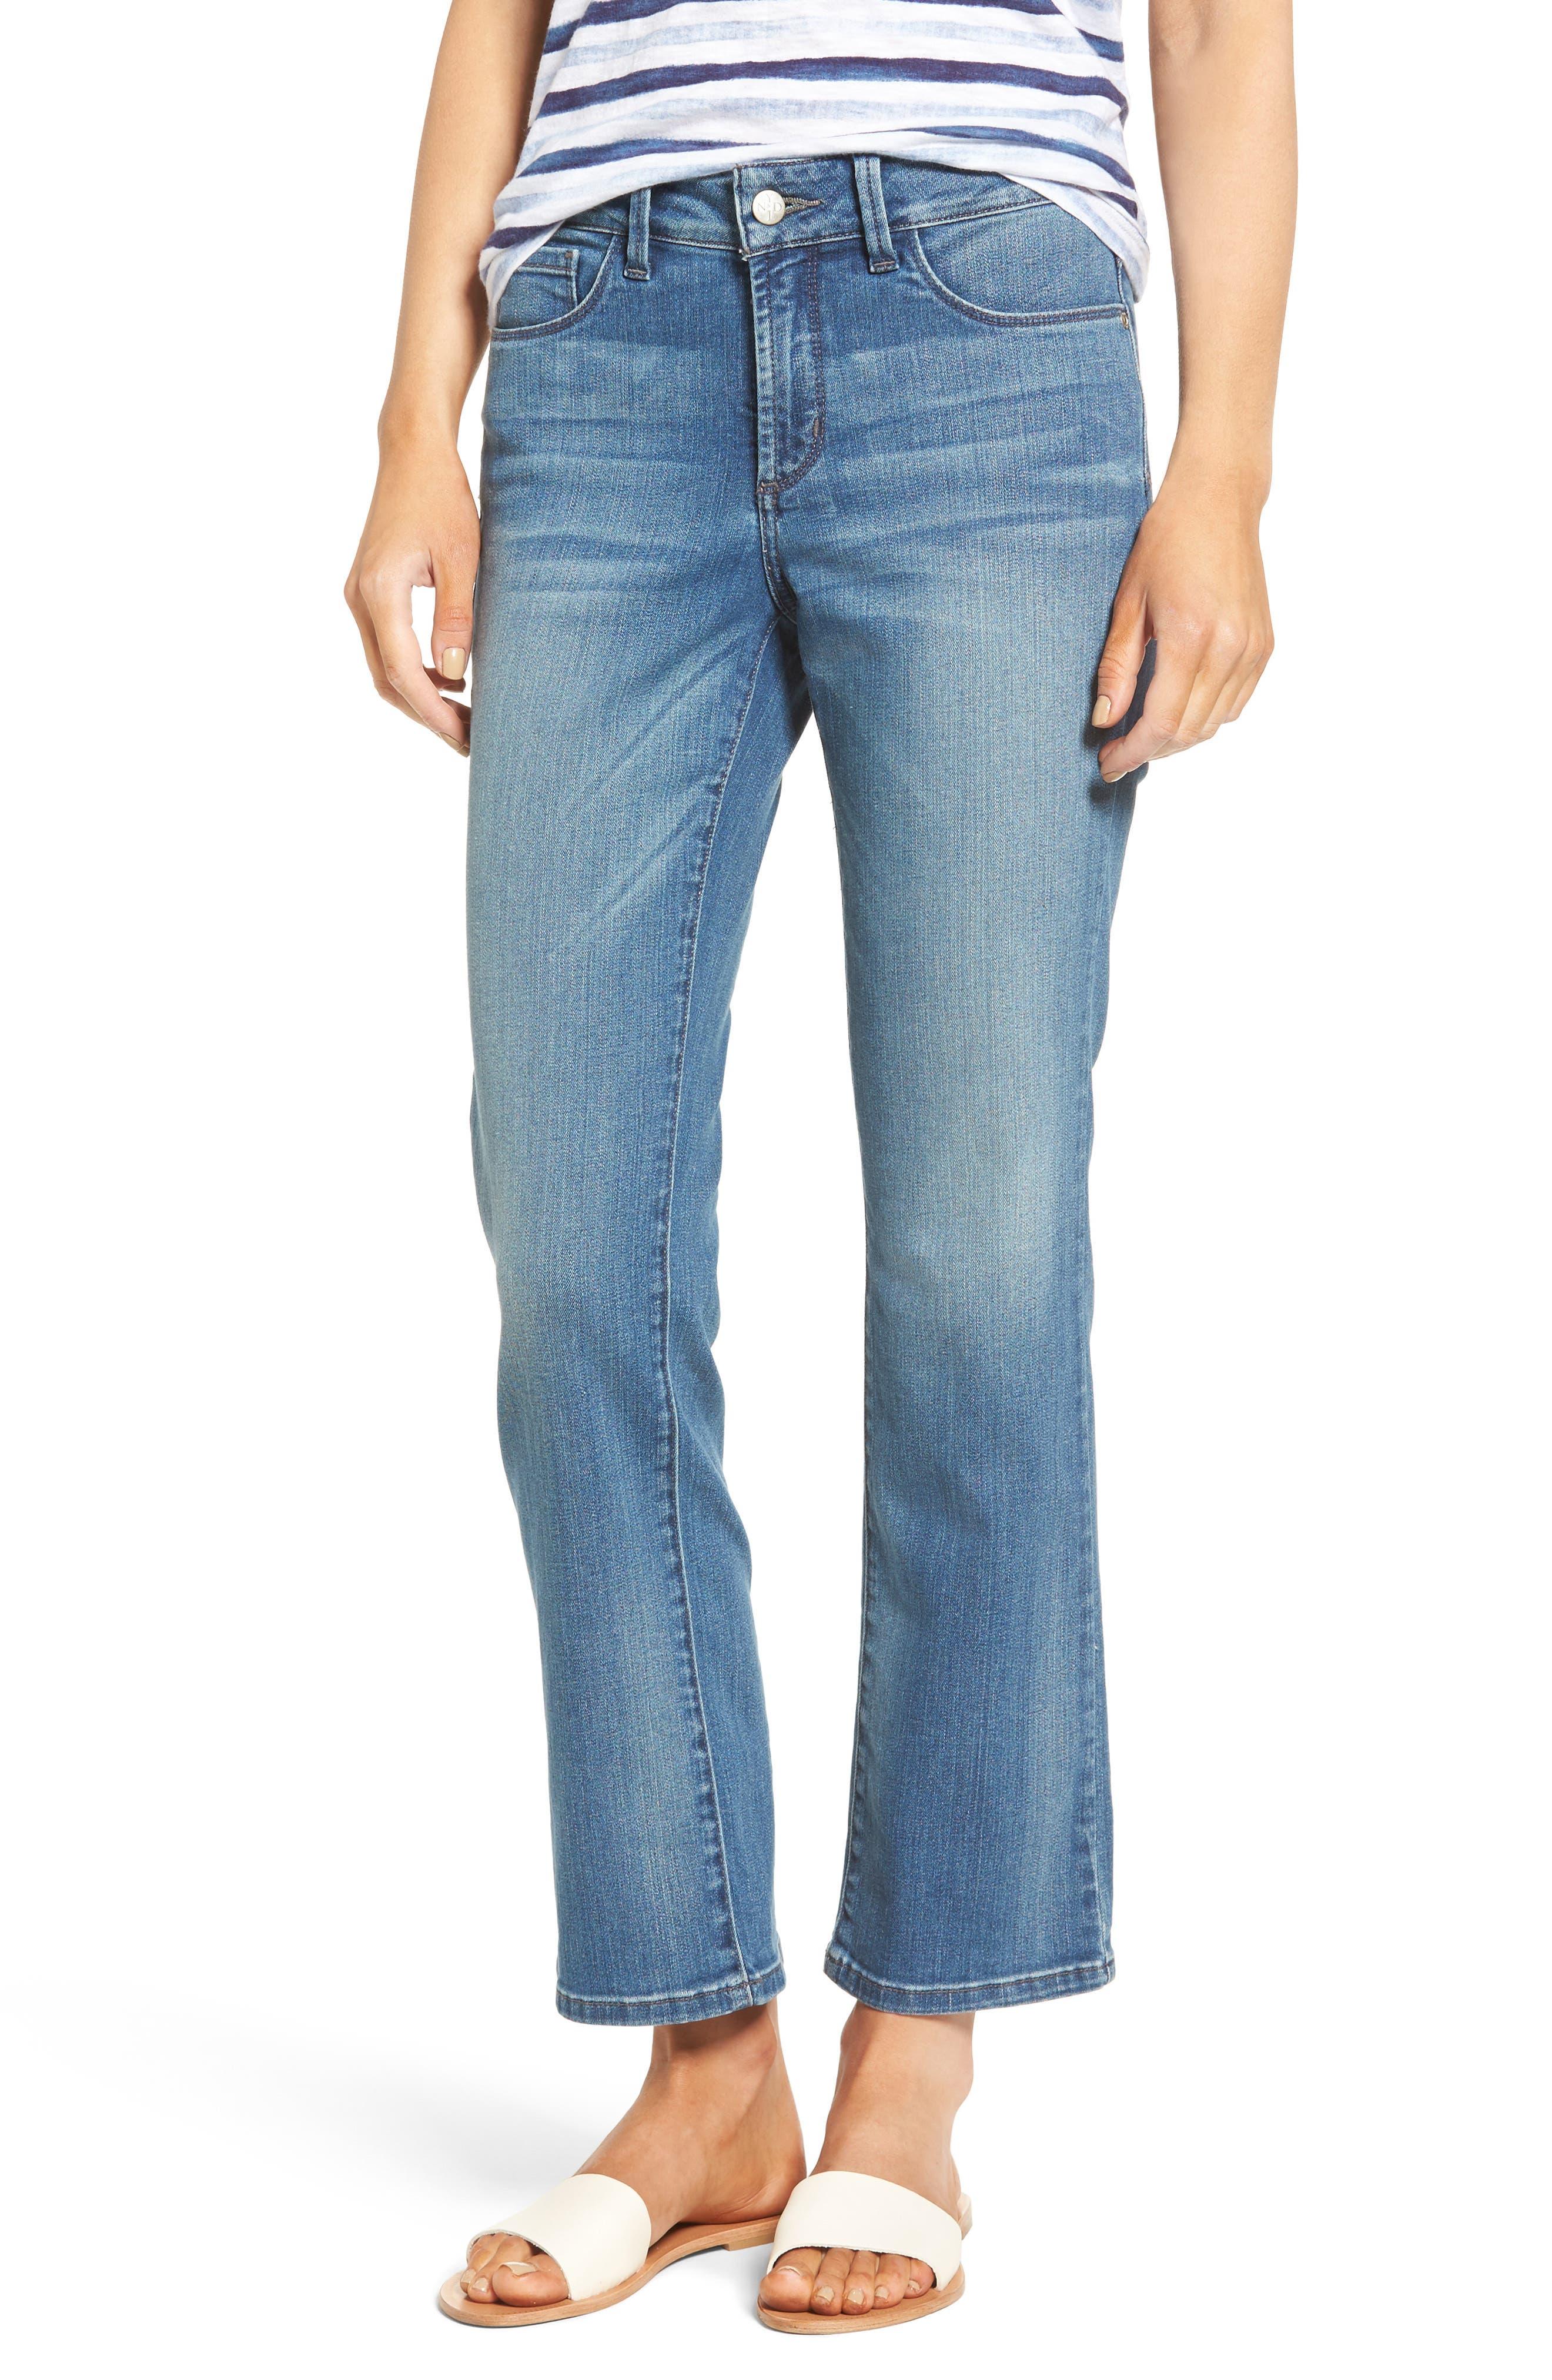 NYDJ Amanda Stretch Bootcut Ankle Jeans (Clean Paloma) (Regular & Petite)